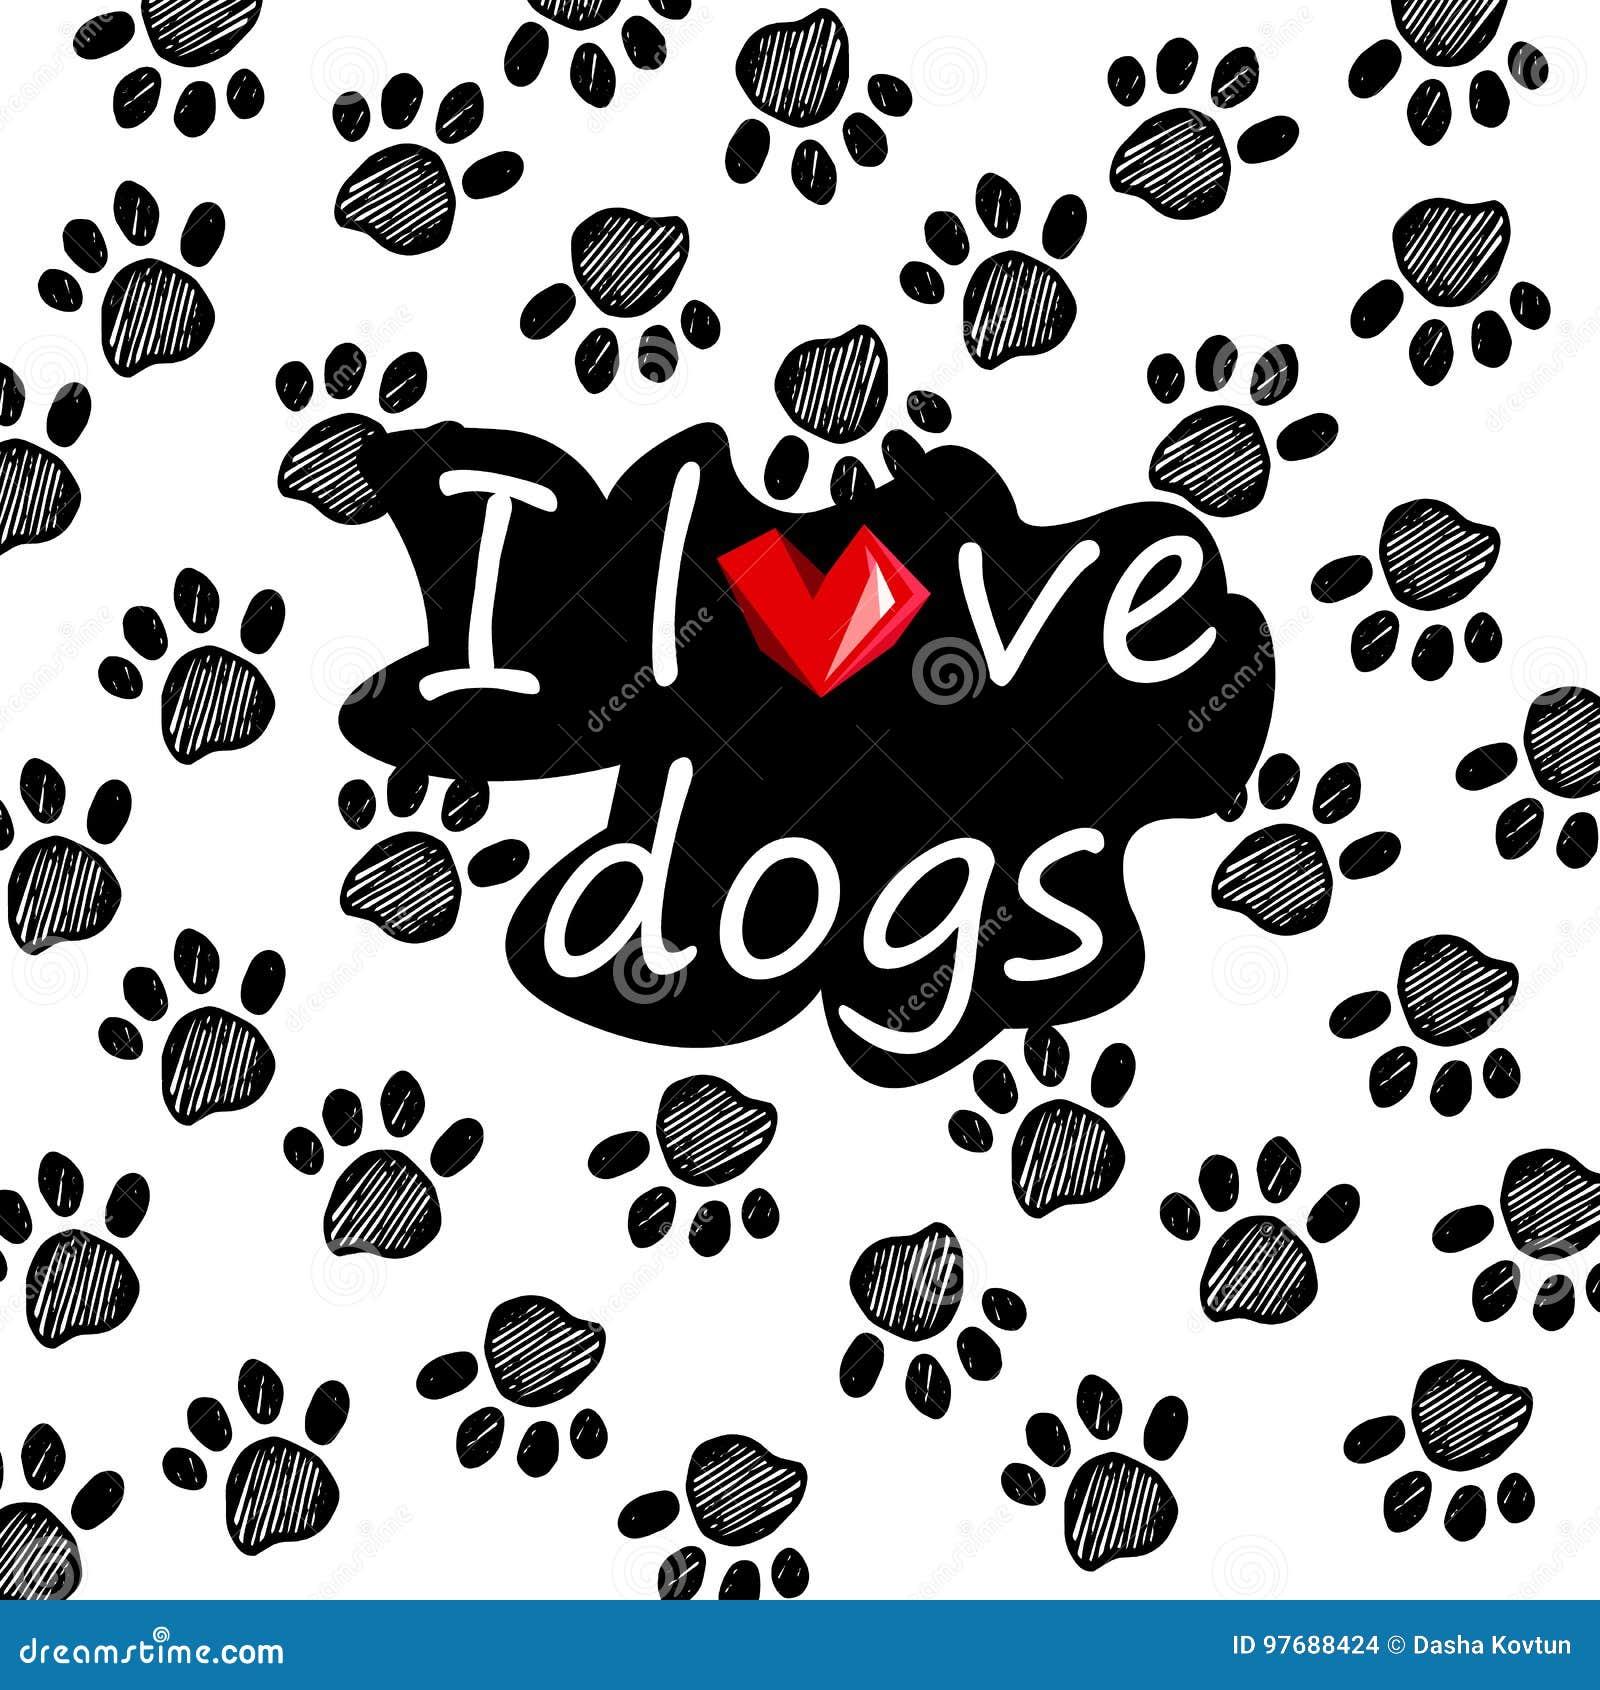 Love me, love my dog. Hand drawn